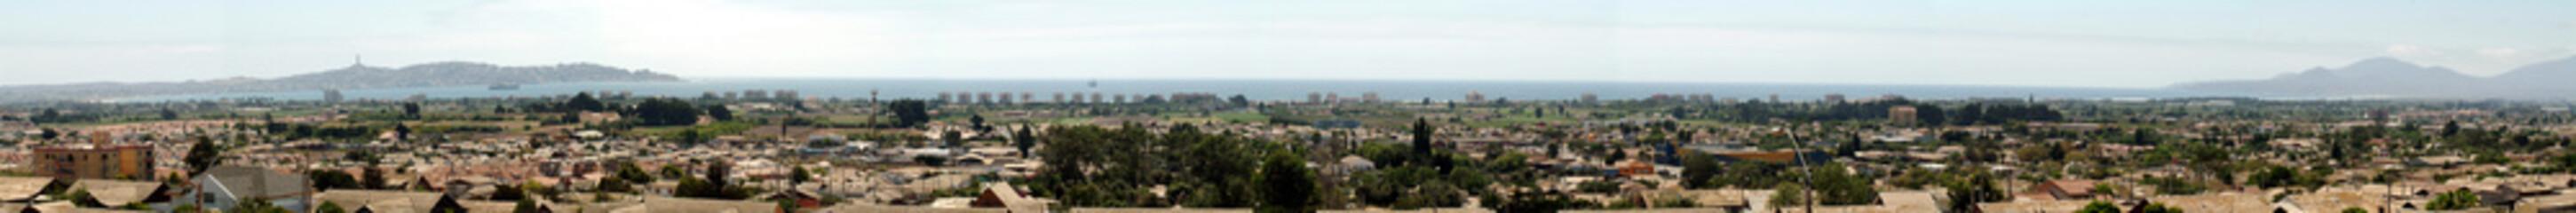 Panoramica Coquimbo La Serena